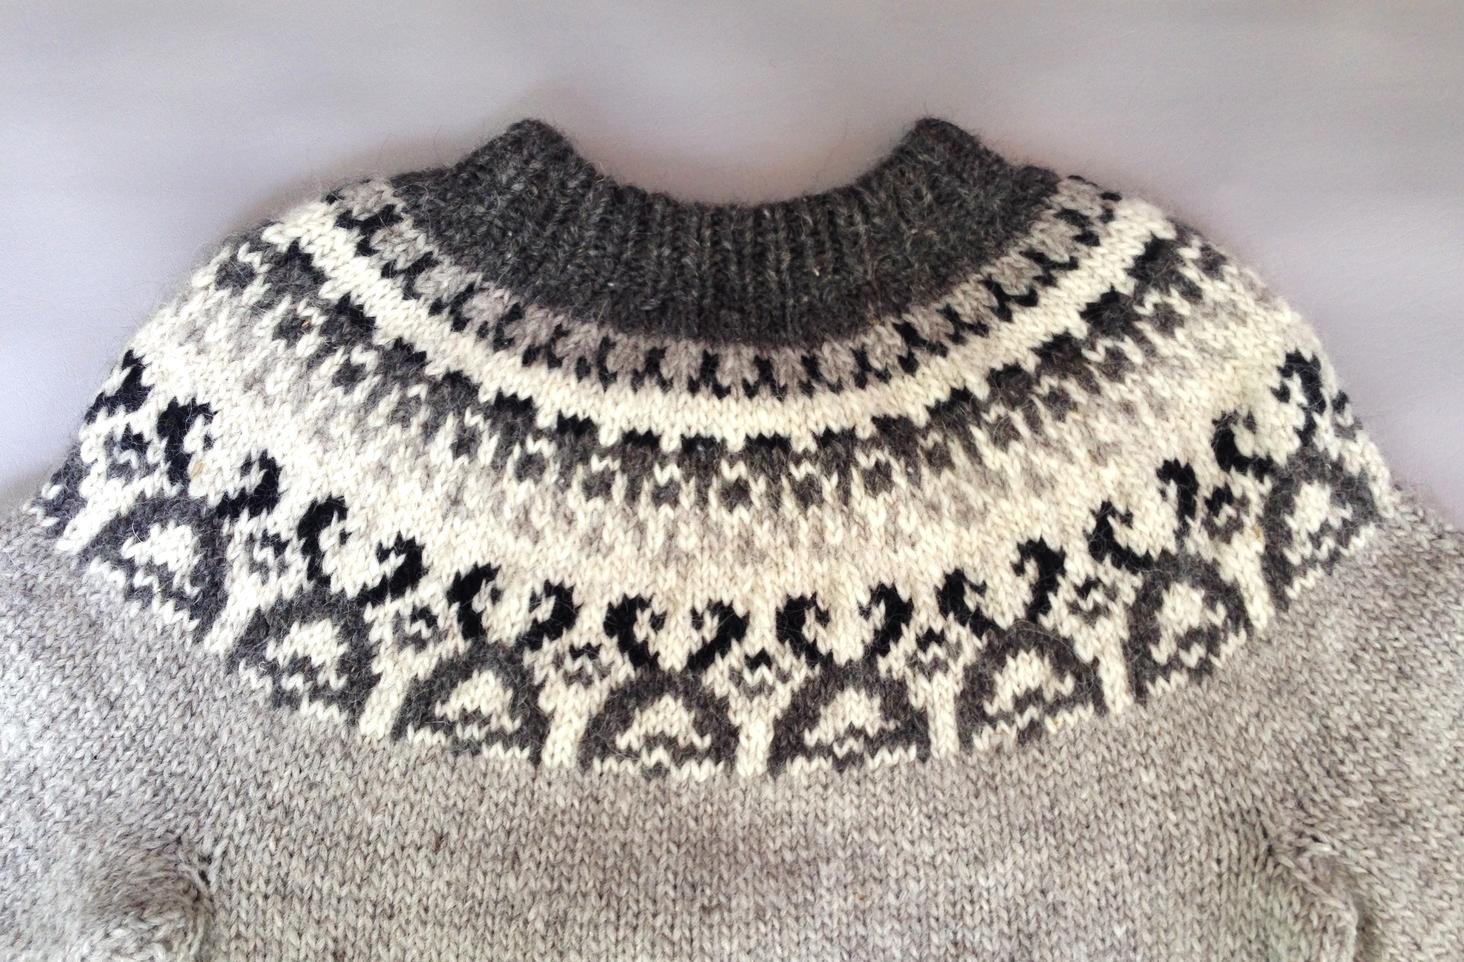 Men's vintage hand knit fair isle sweater